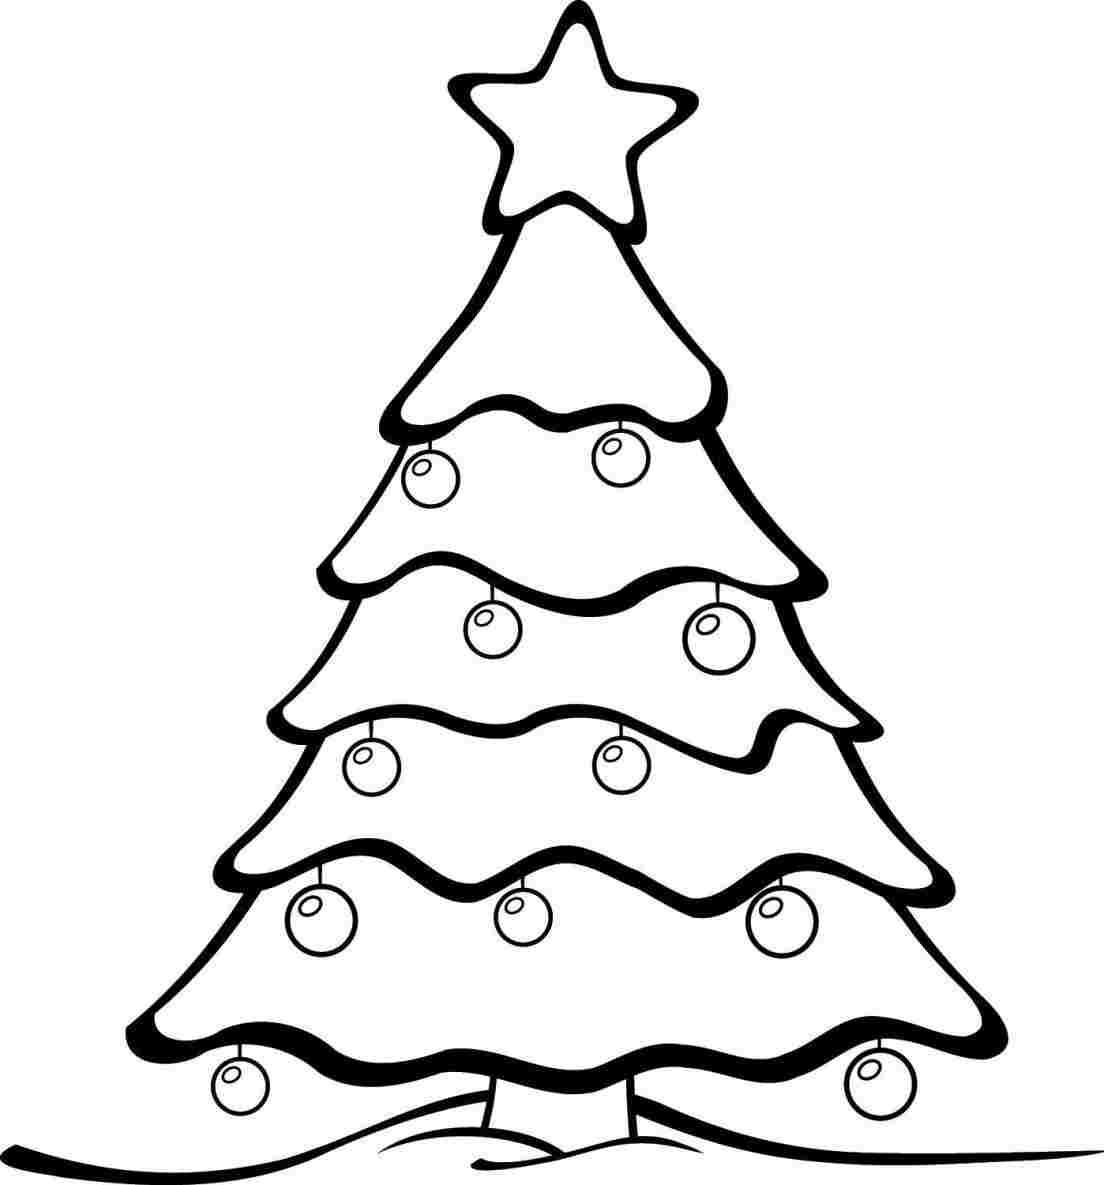 1104x1185 Simple Christmas Tree Line Drawing